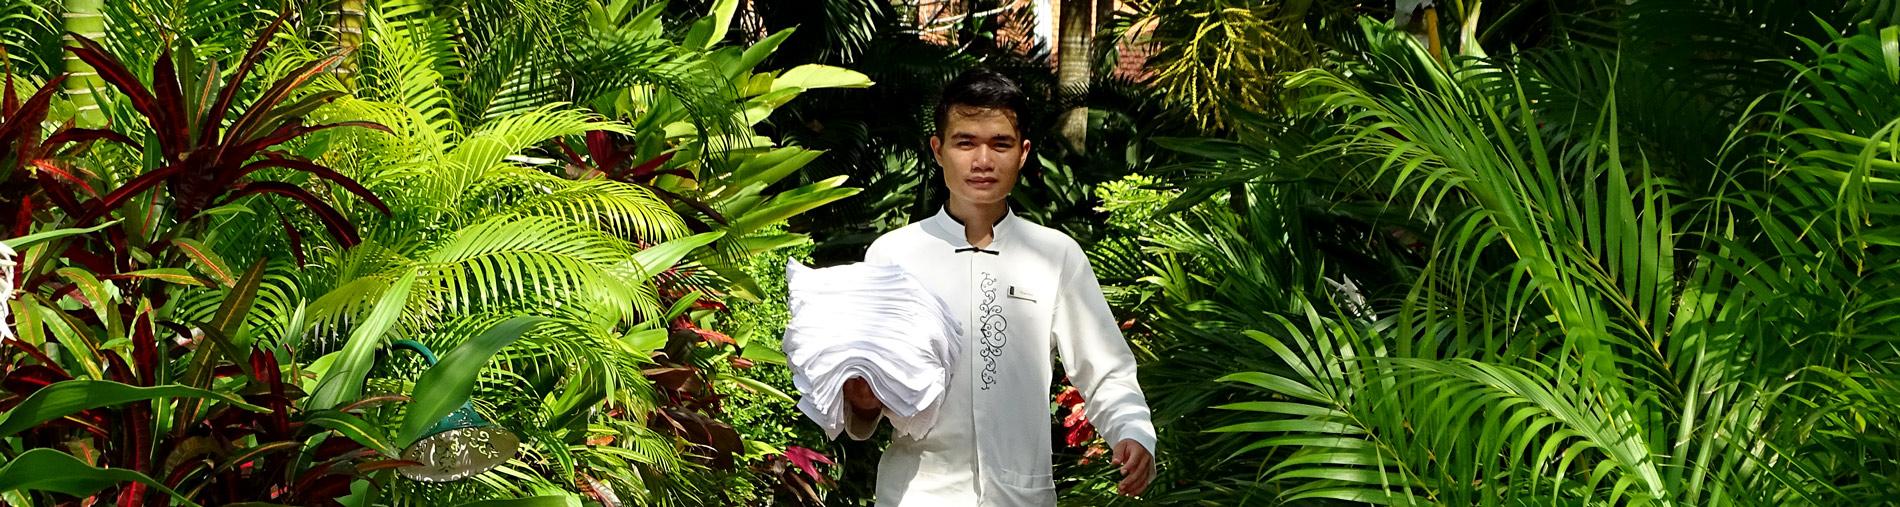 rondreis vietnam hotels